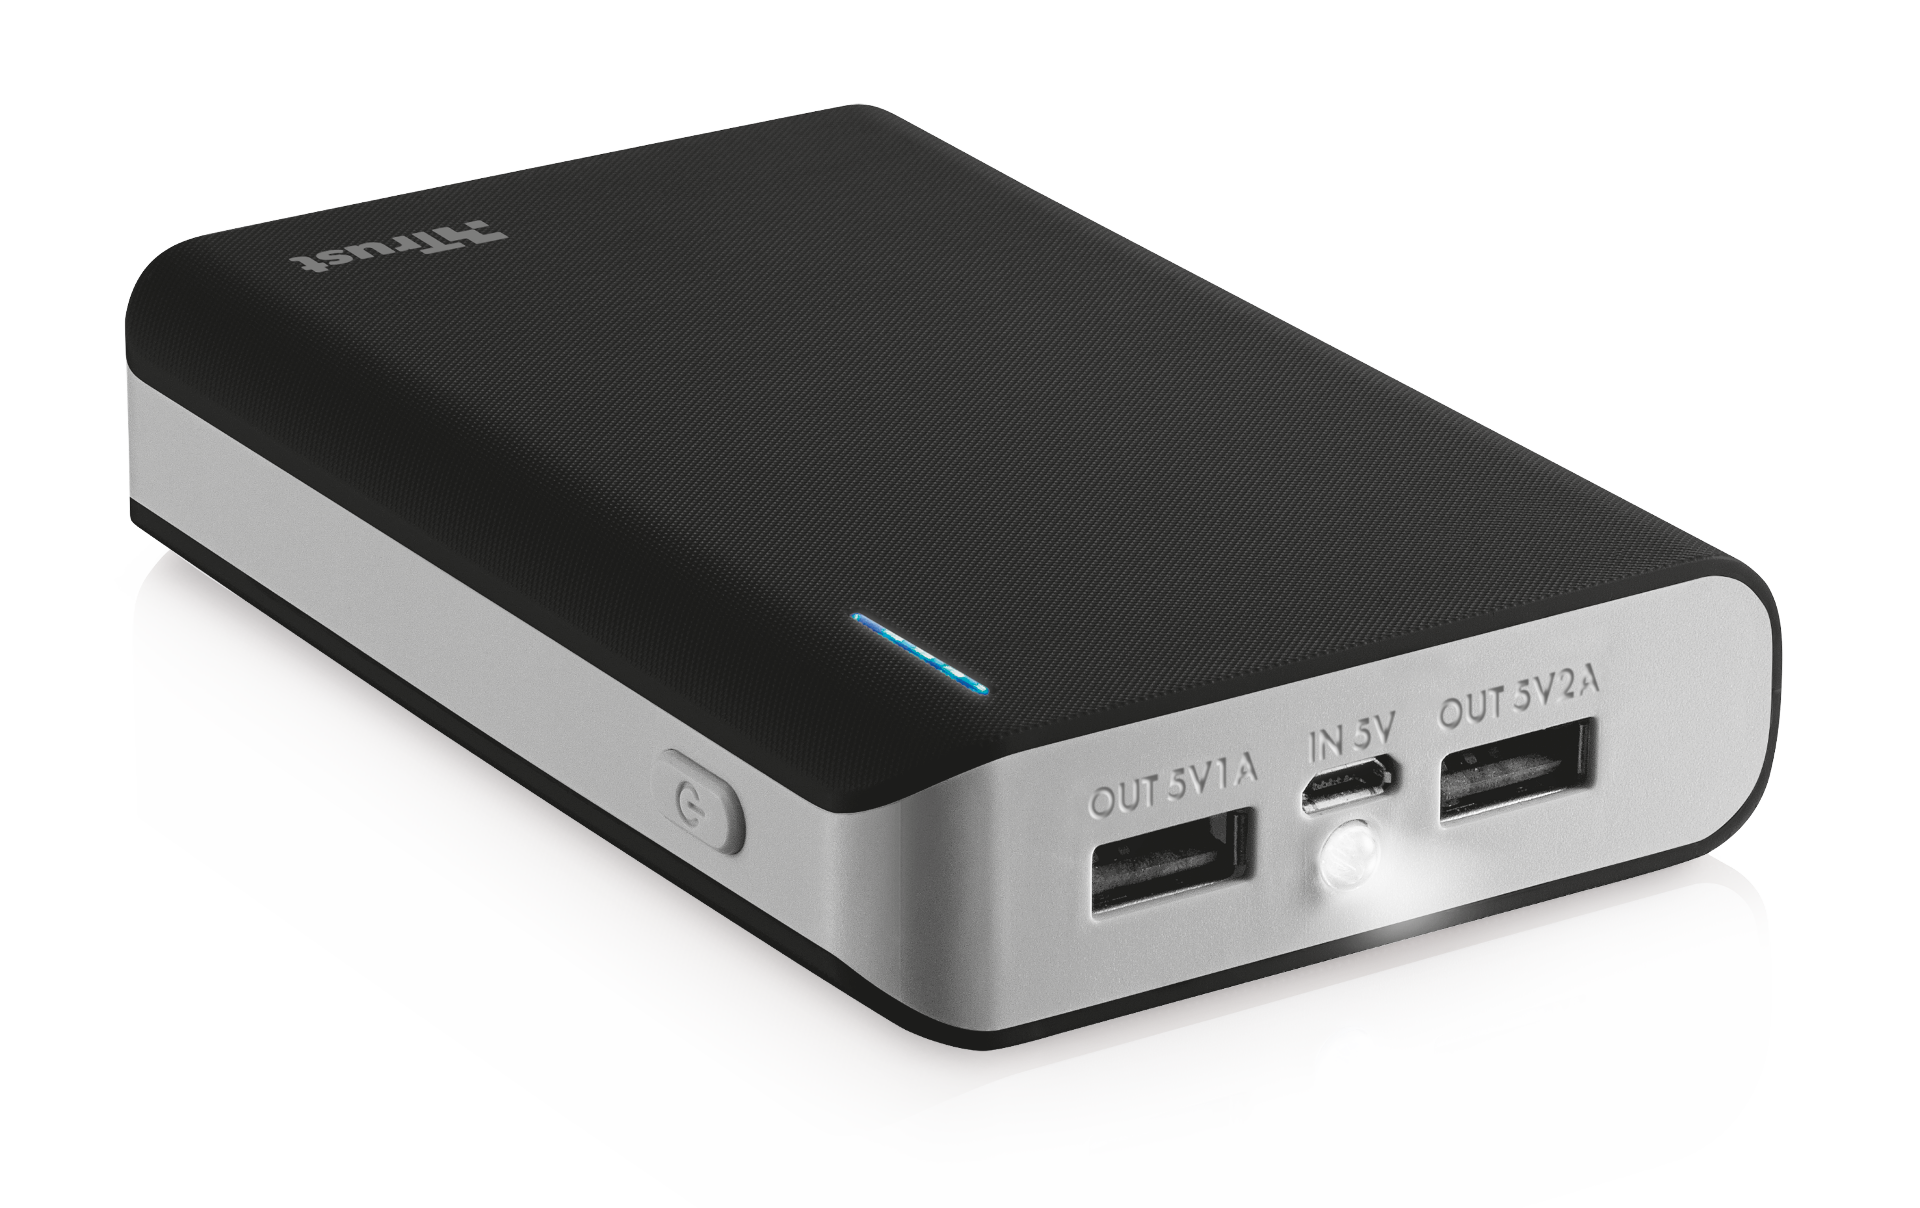 Primo PowerBank 8800 Portable Charger - black